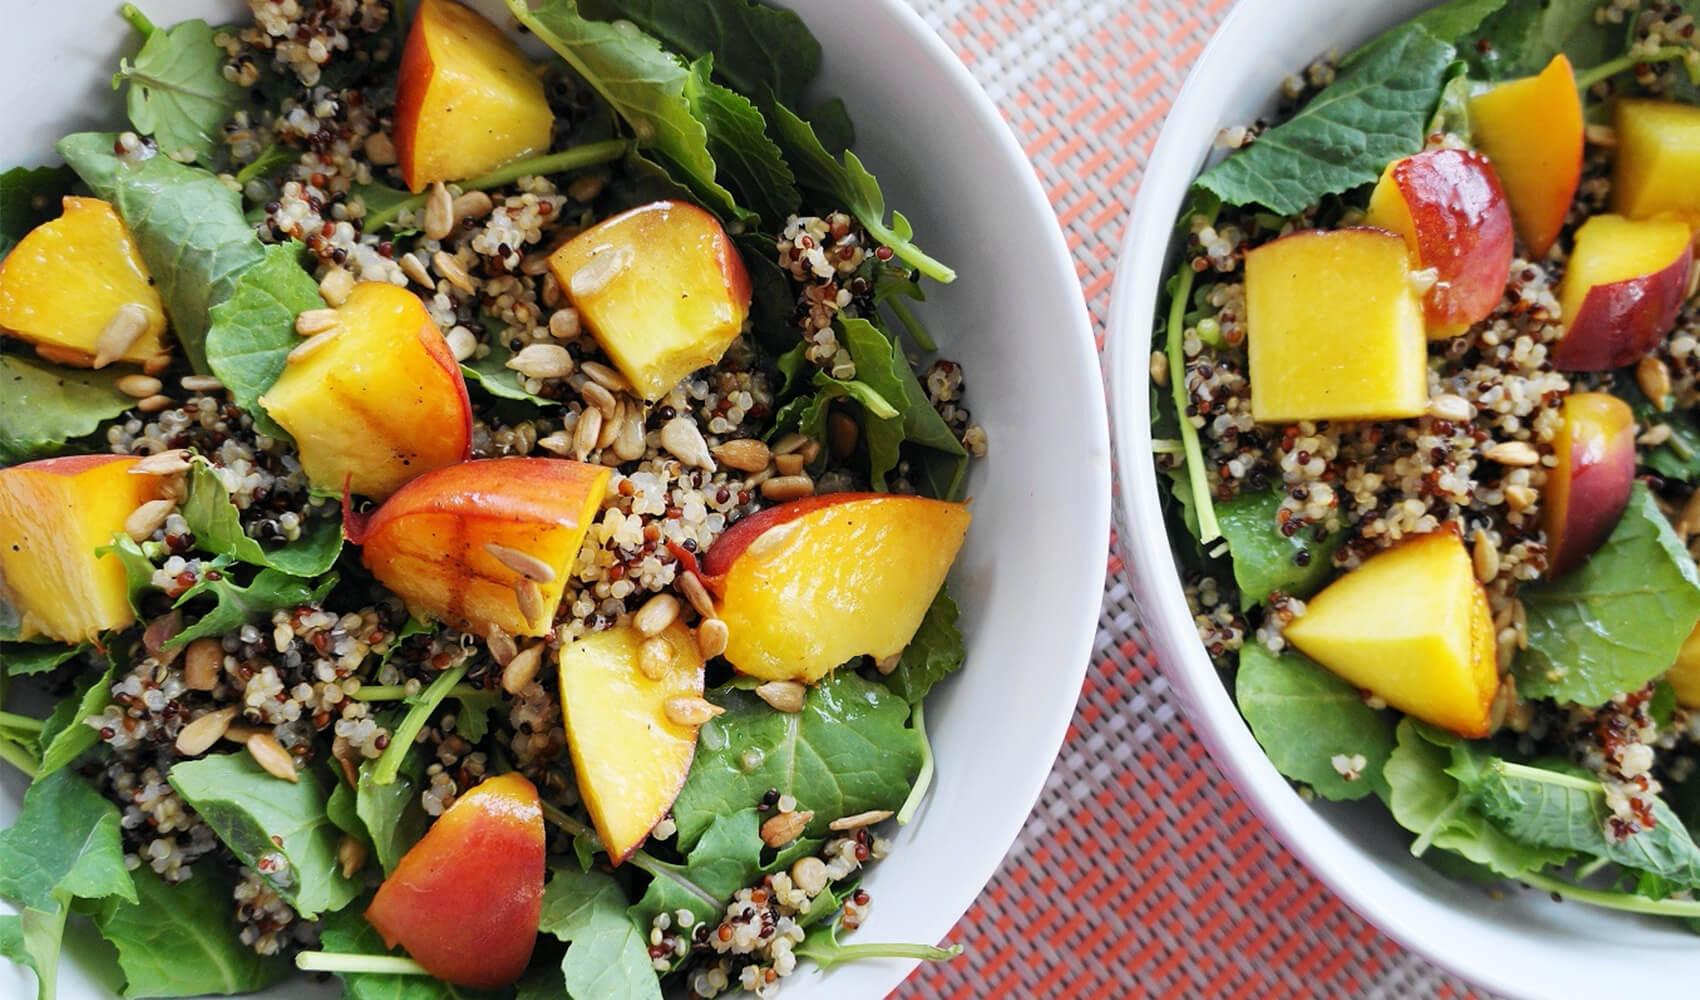 Grilled Peach & Kale Salad with Dijon Vinaigrette